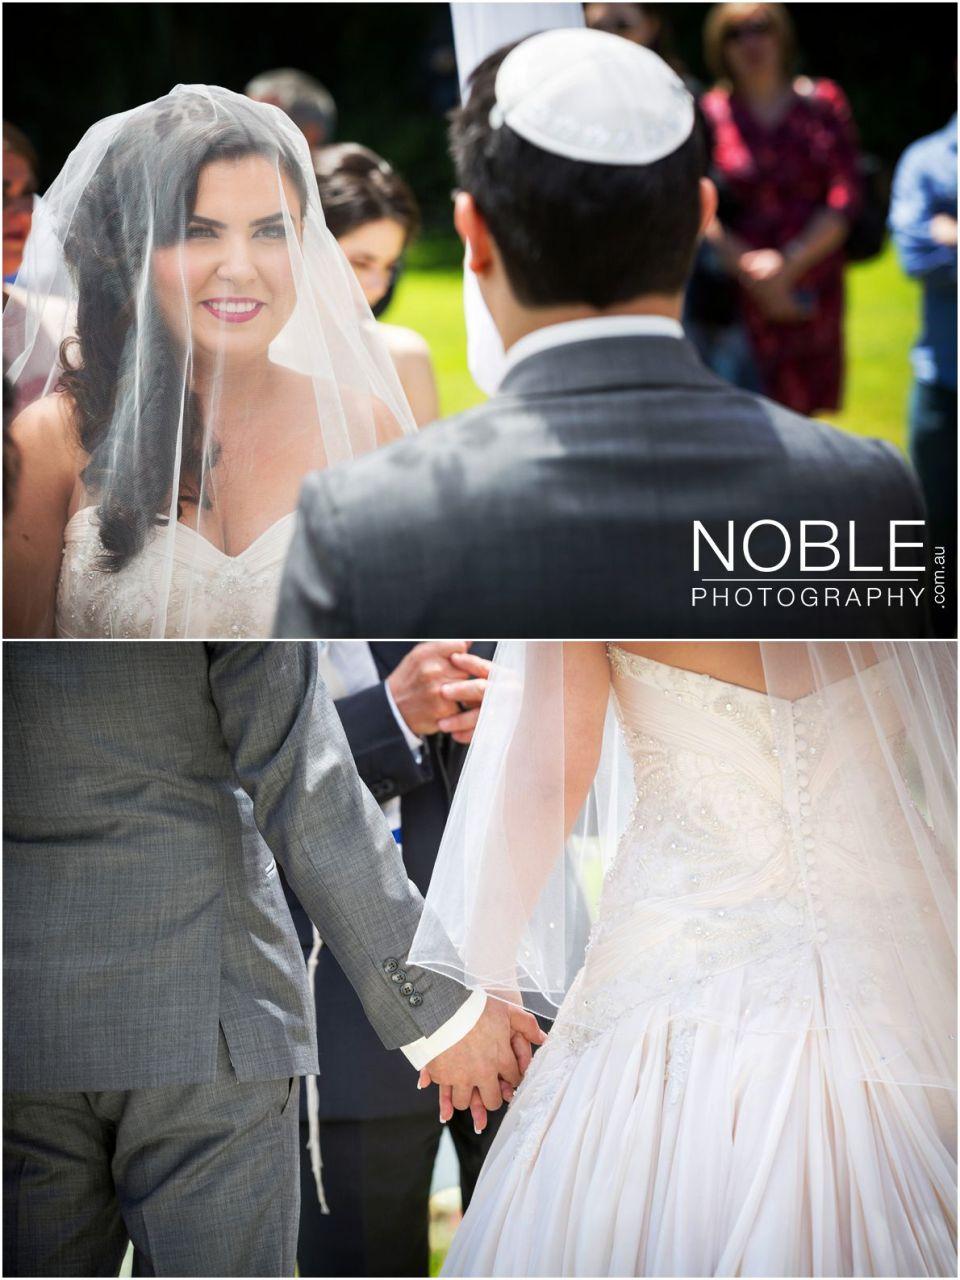 Holding hands at Jewish wedding ceremony